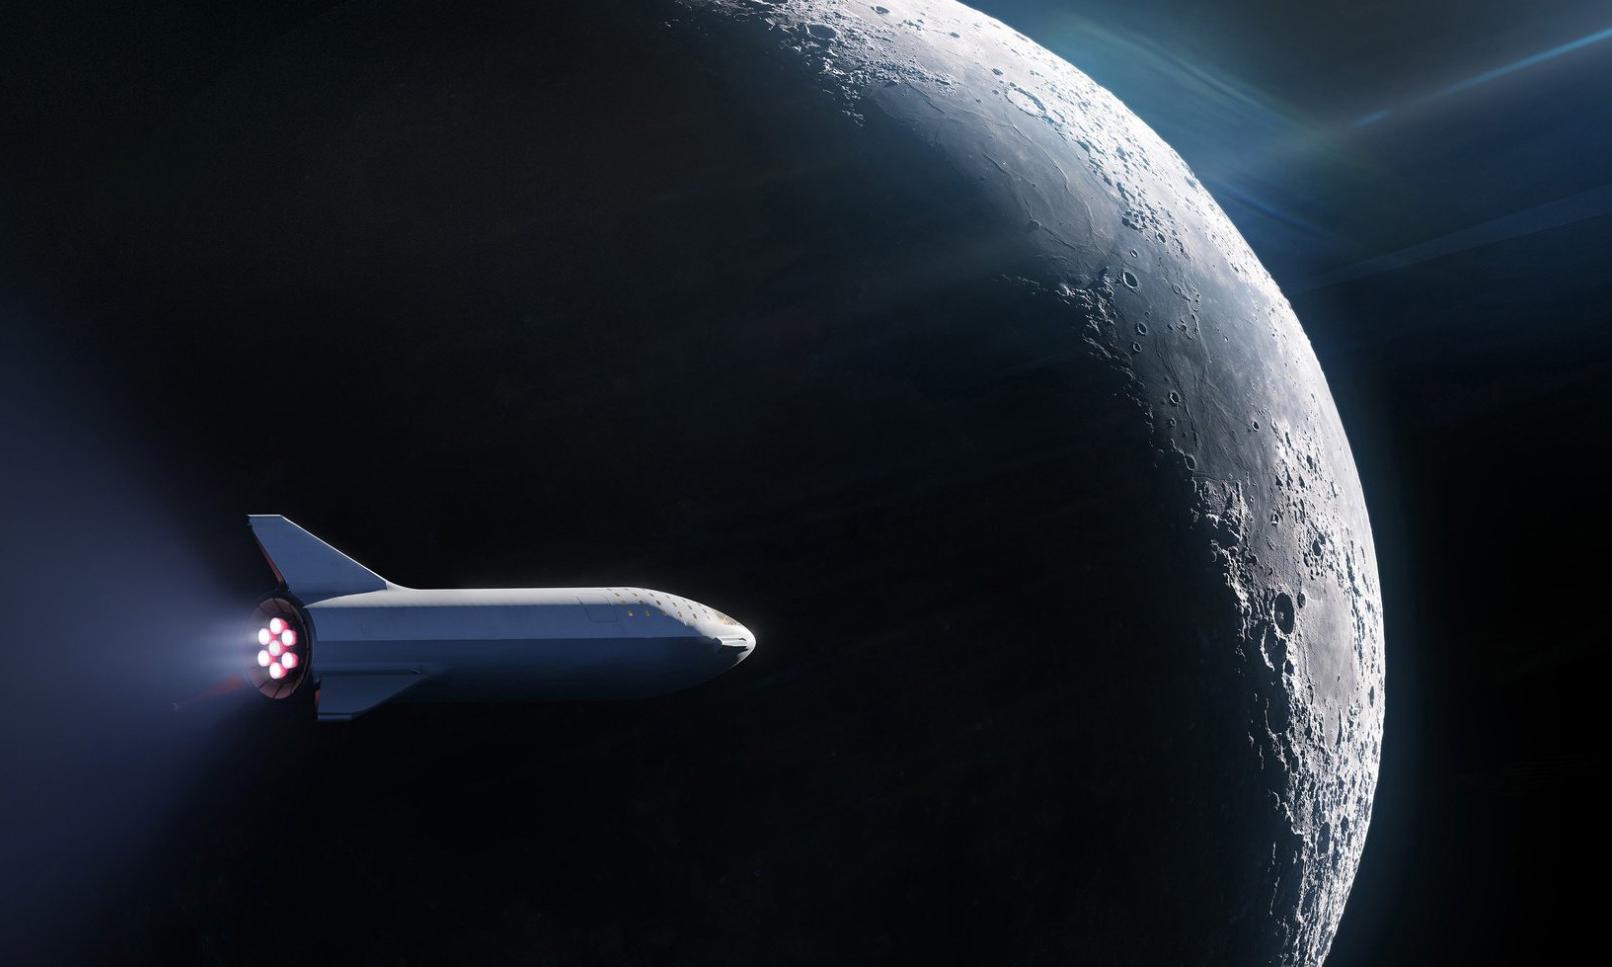 SpaceX 接到世界第一个搭乘 BFR 上月球的旅客订单